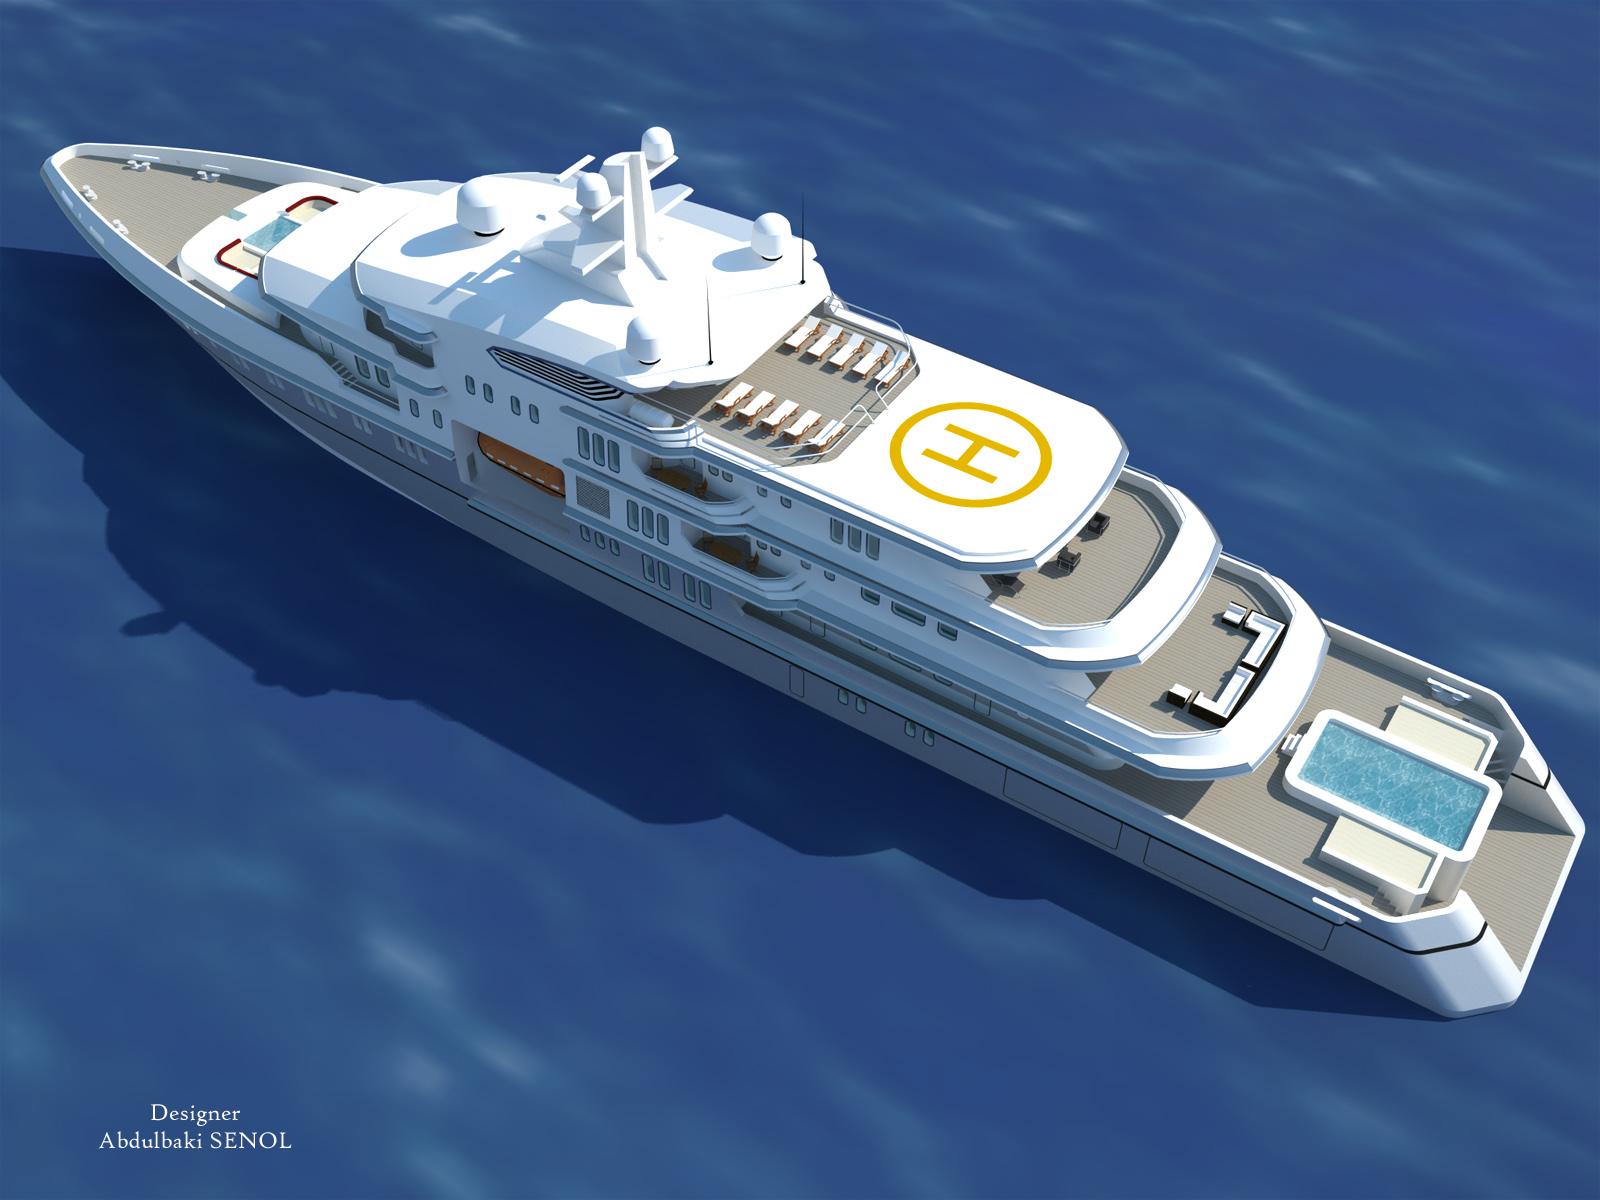 90m Senol Superyacht Design